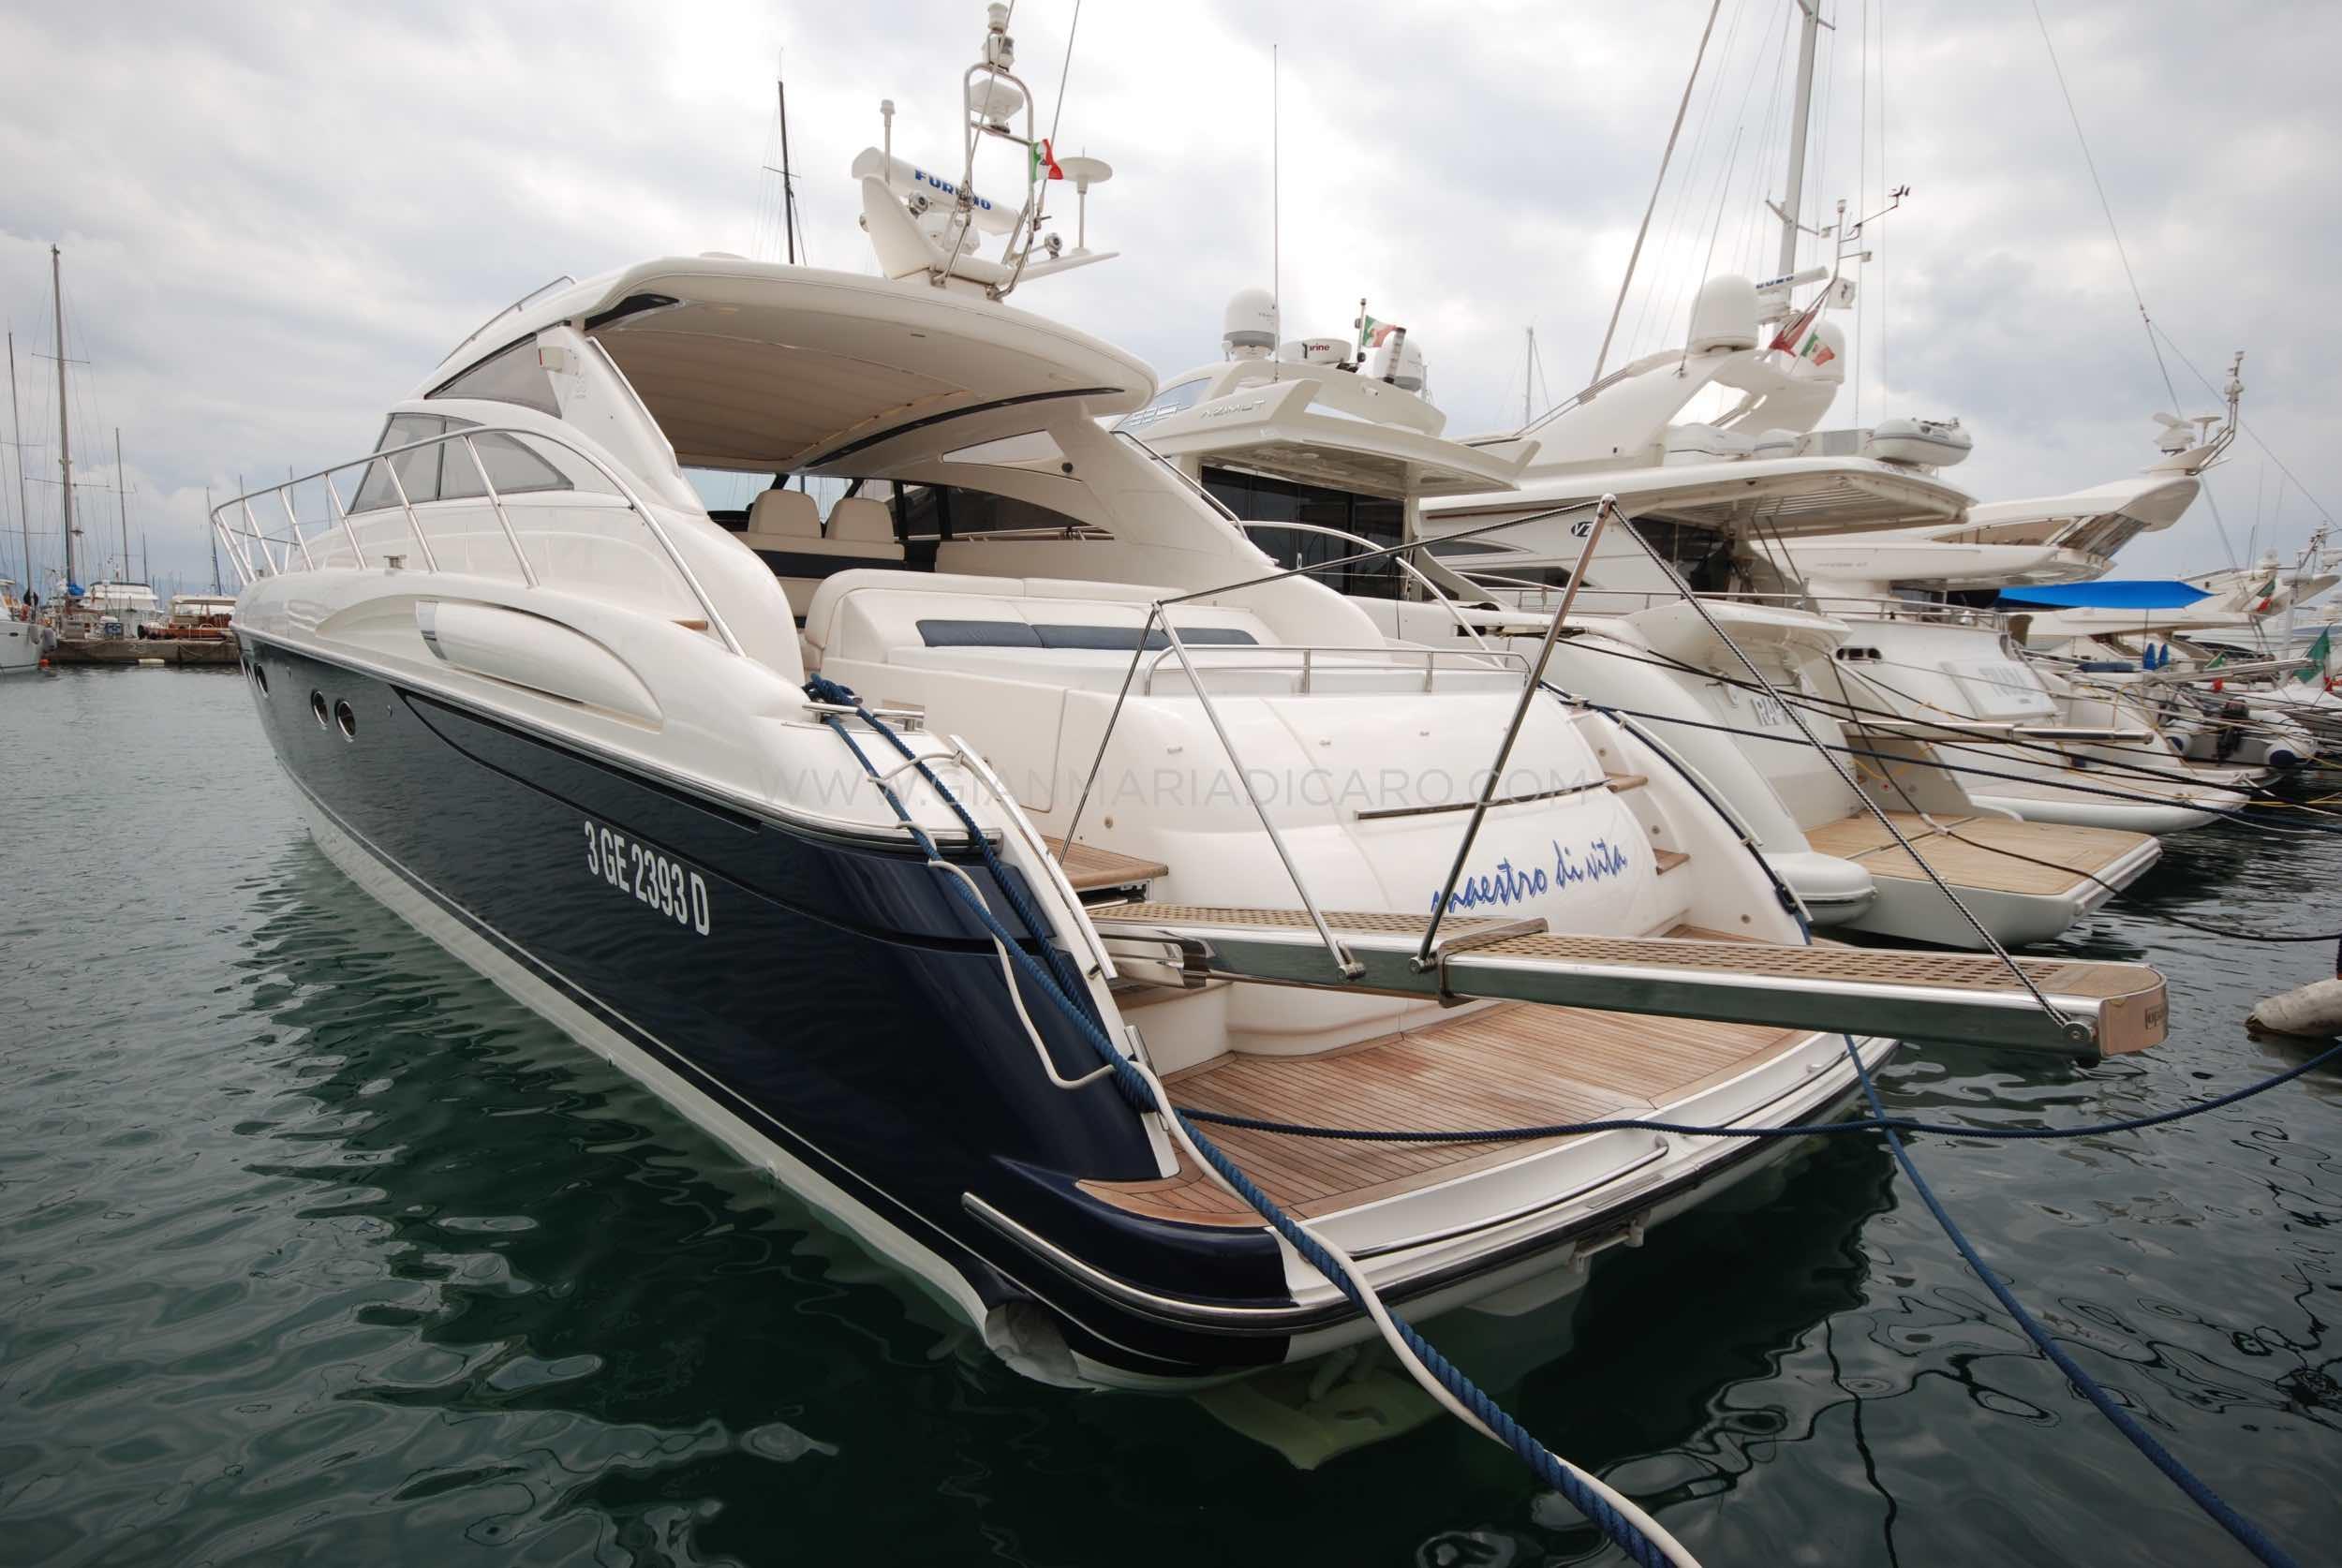 princess-yachts-v58-maestro-di-vita-for-sale-2.jpg